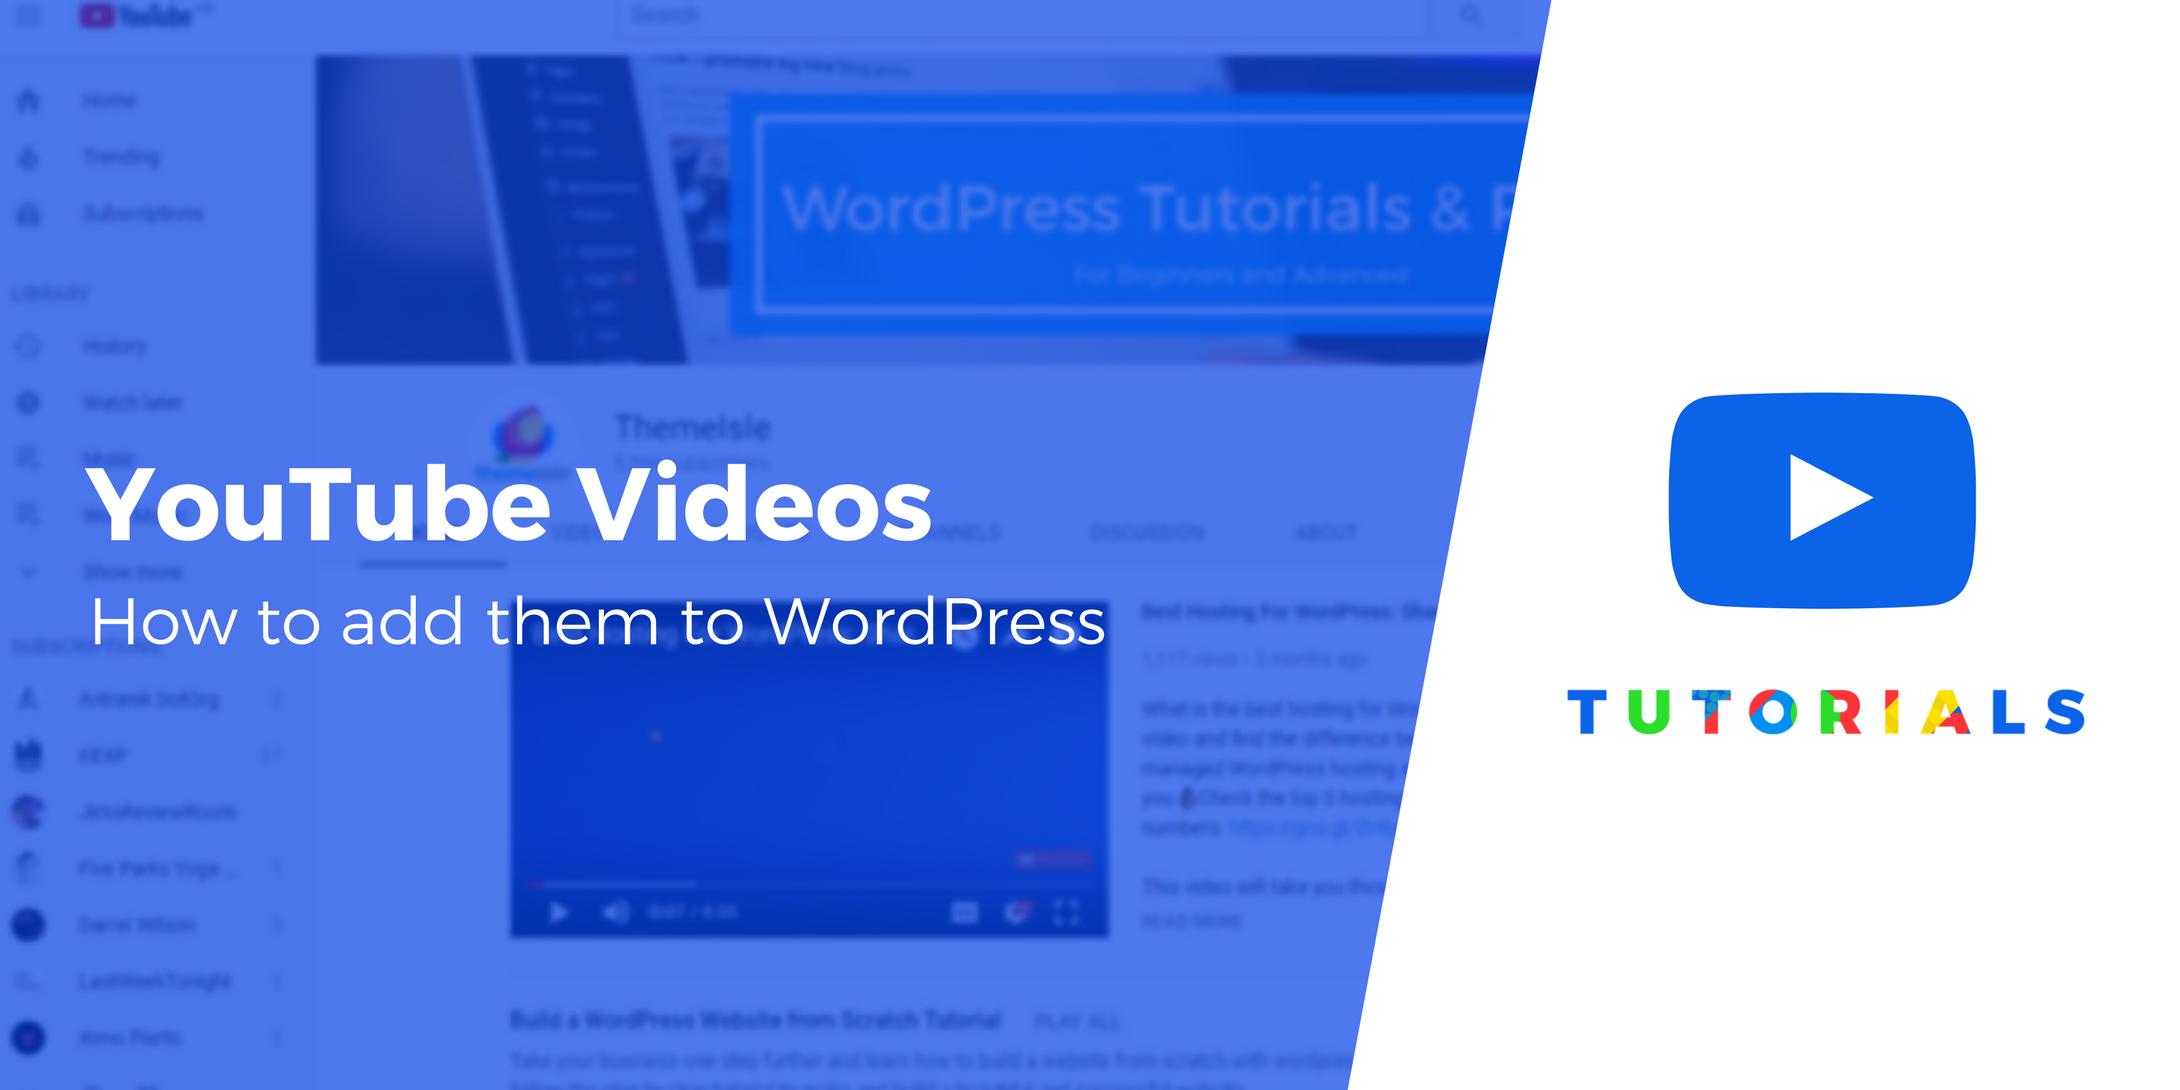 Add YouTube videos to WordPress